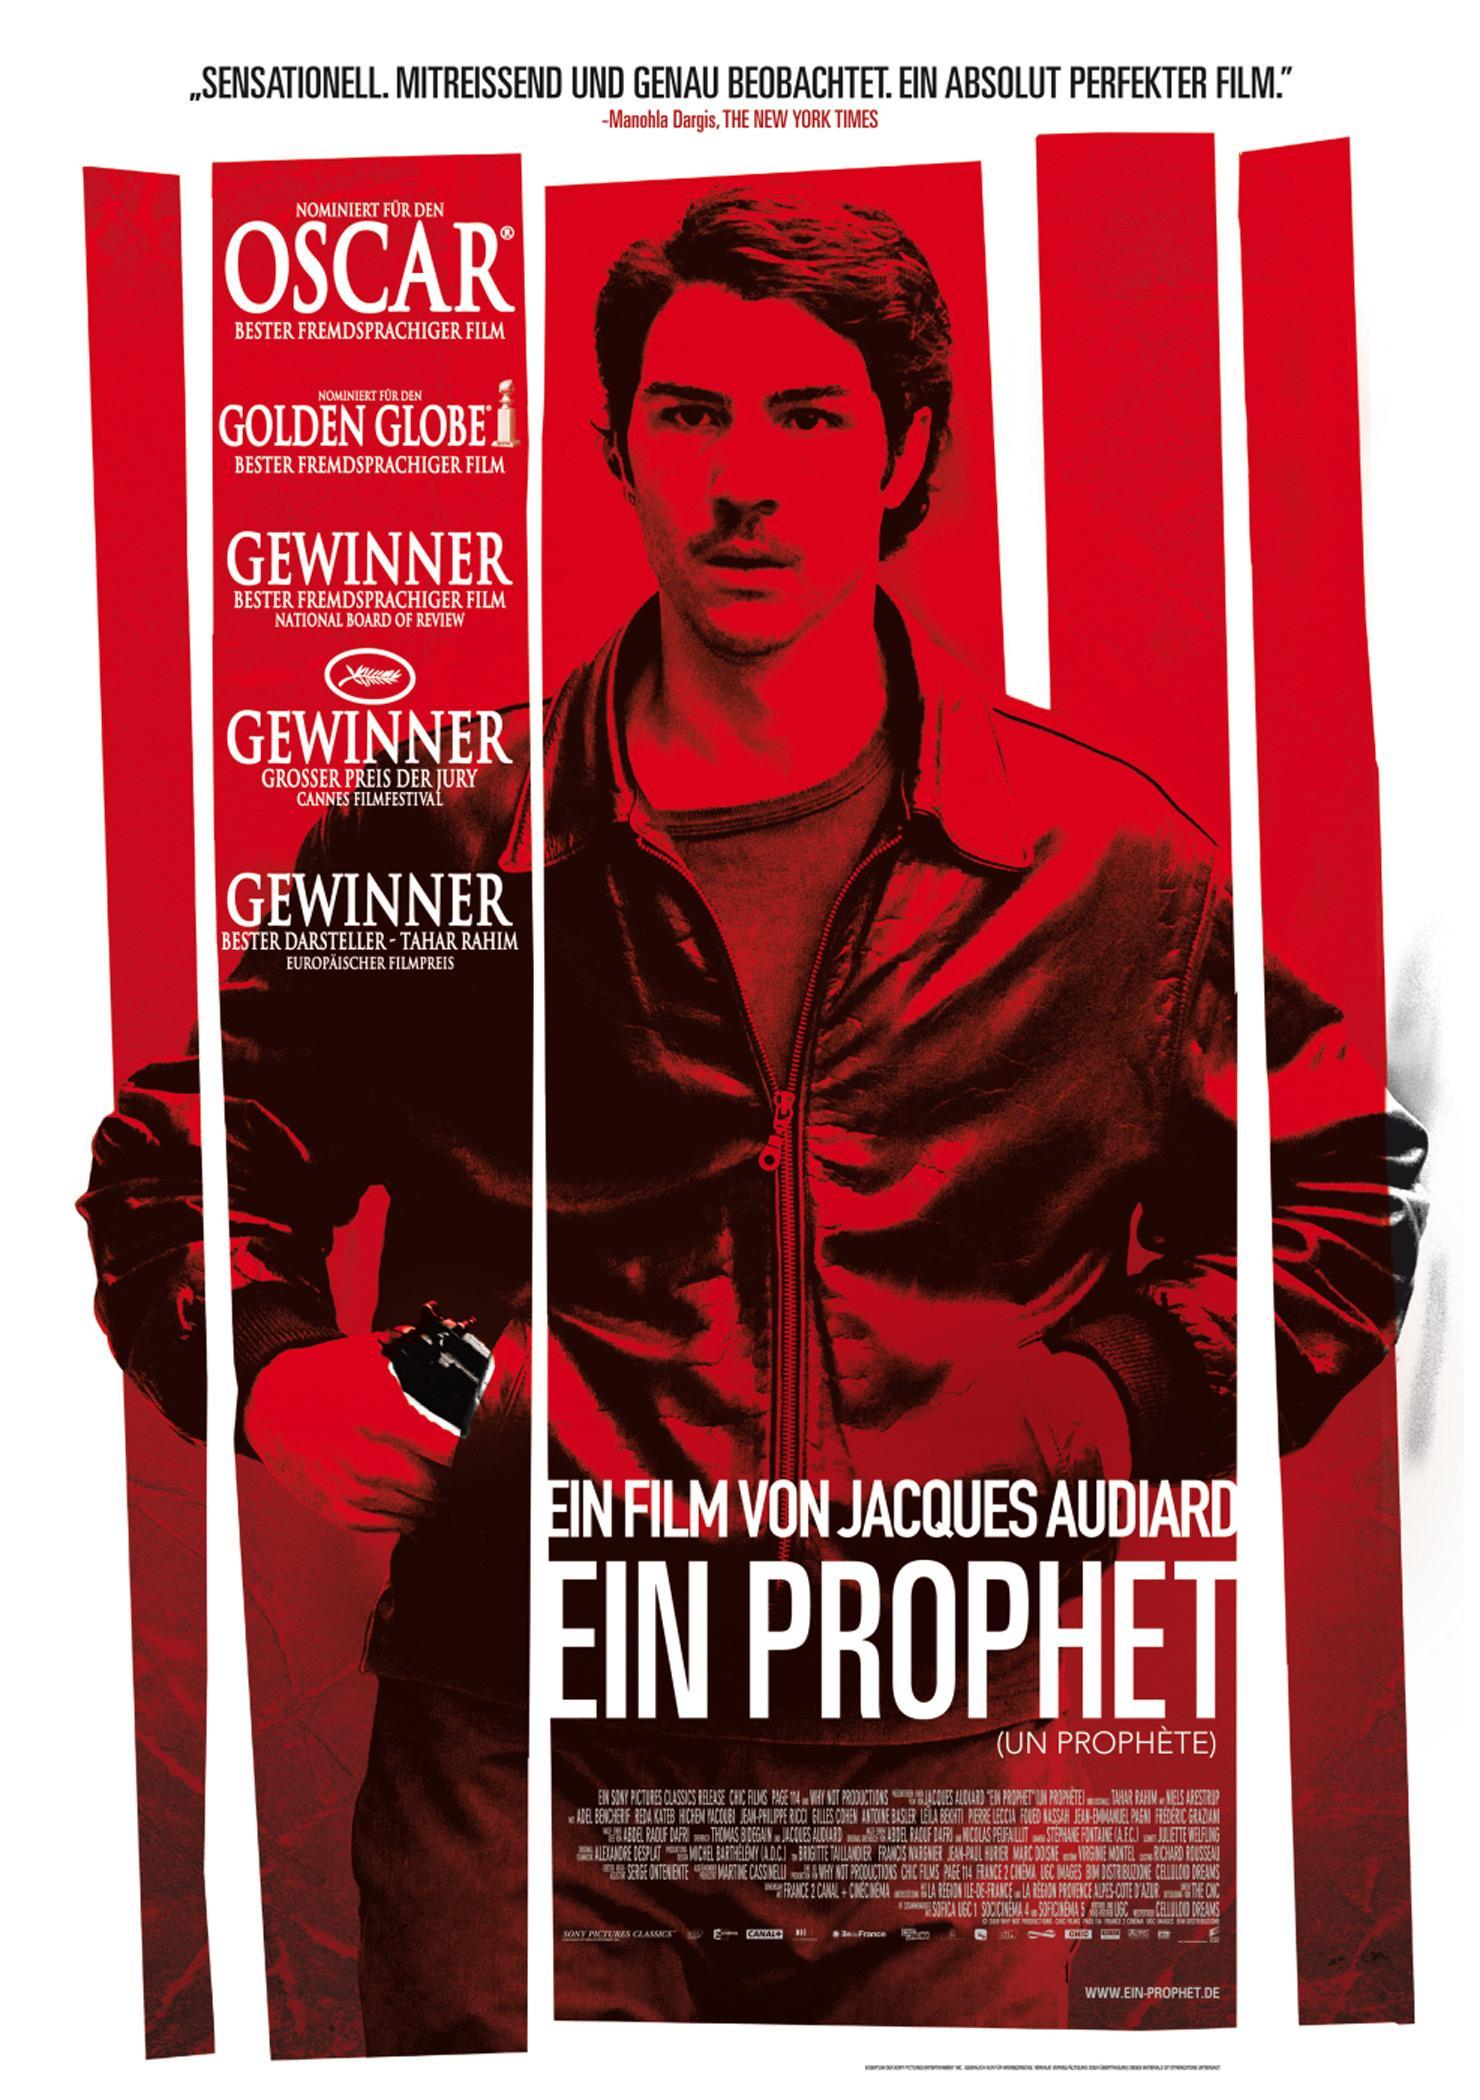 Ein Prophet (Poster)